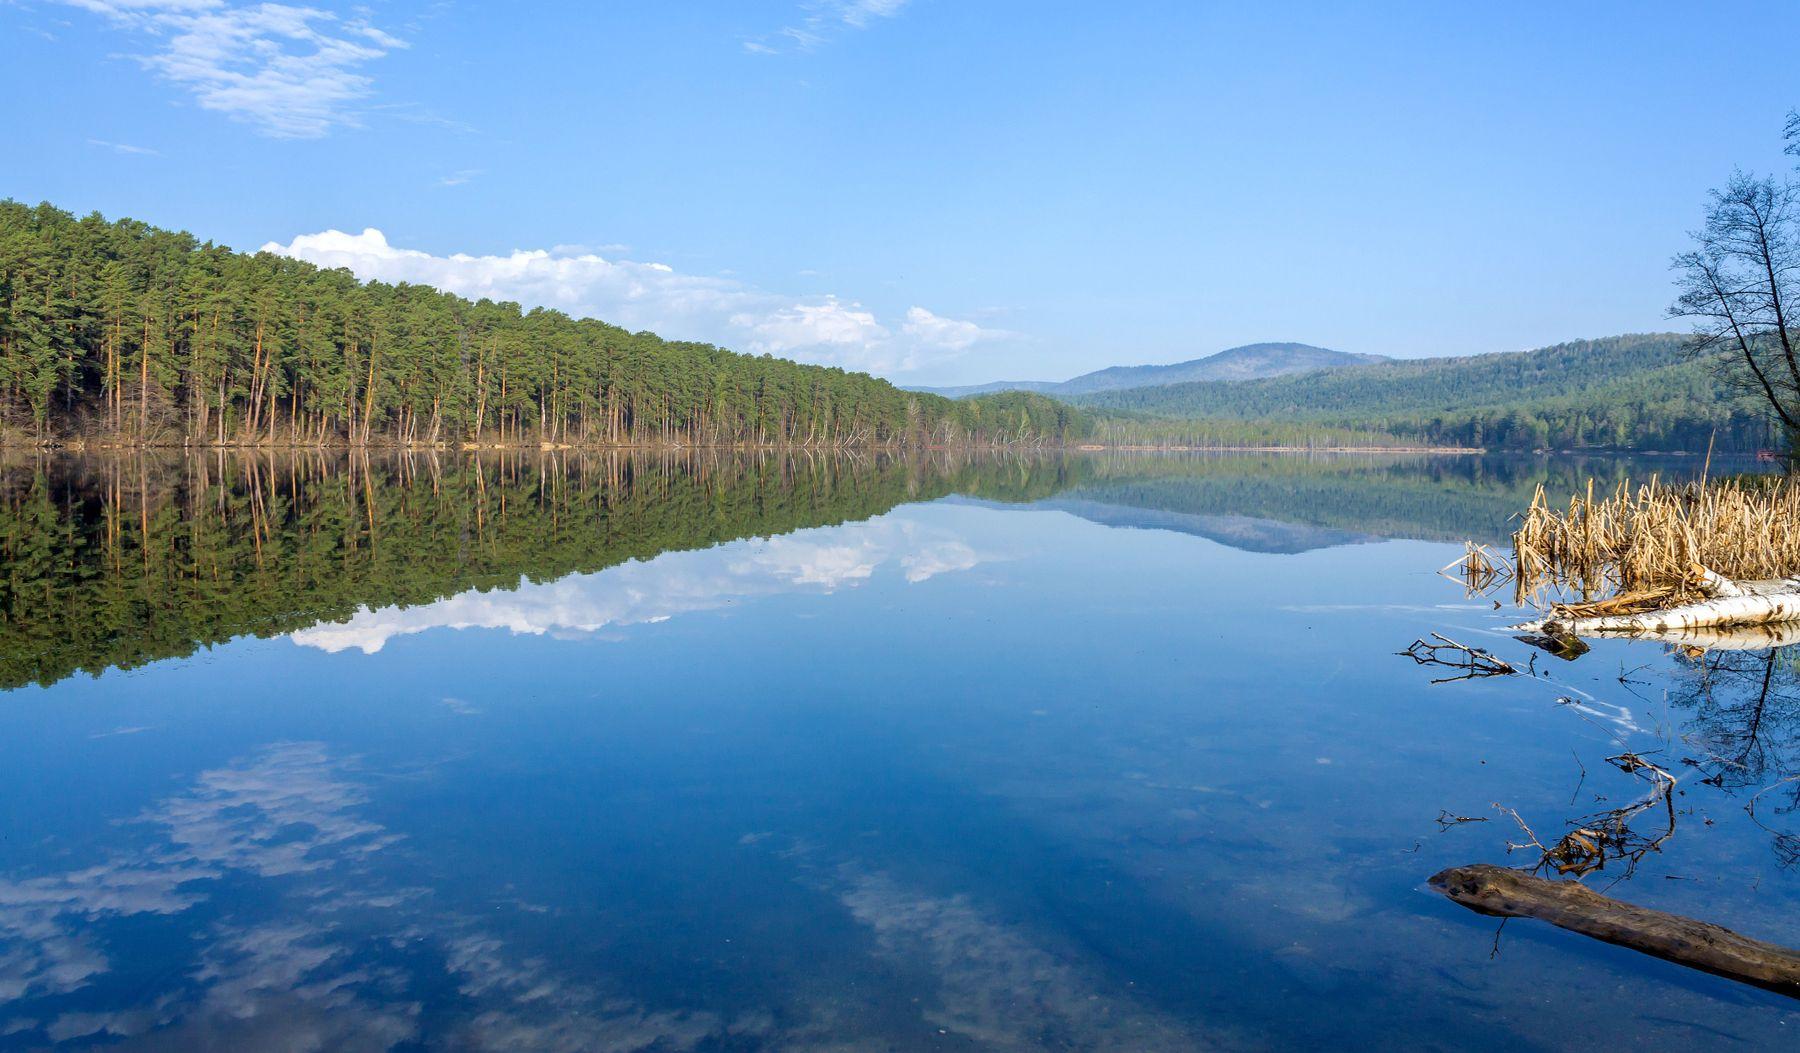 Утро на озеро Инышко Южный Урал Миасс Инышко весна